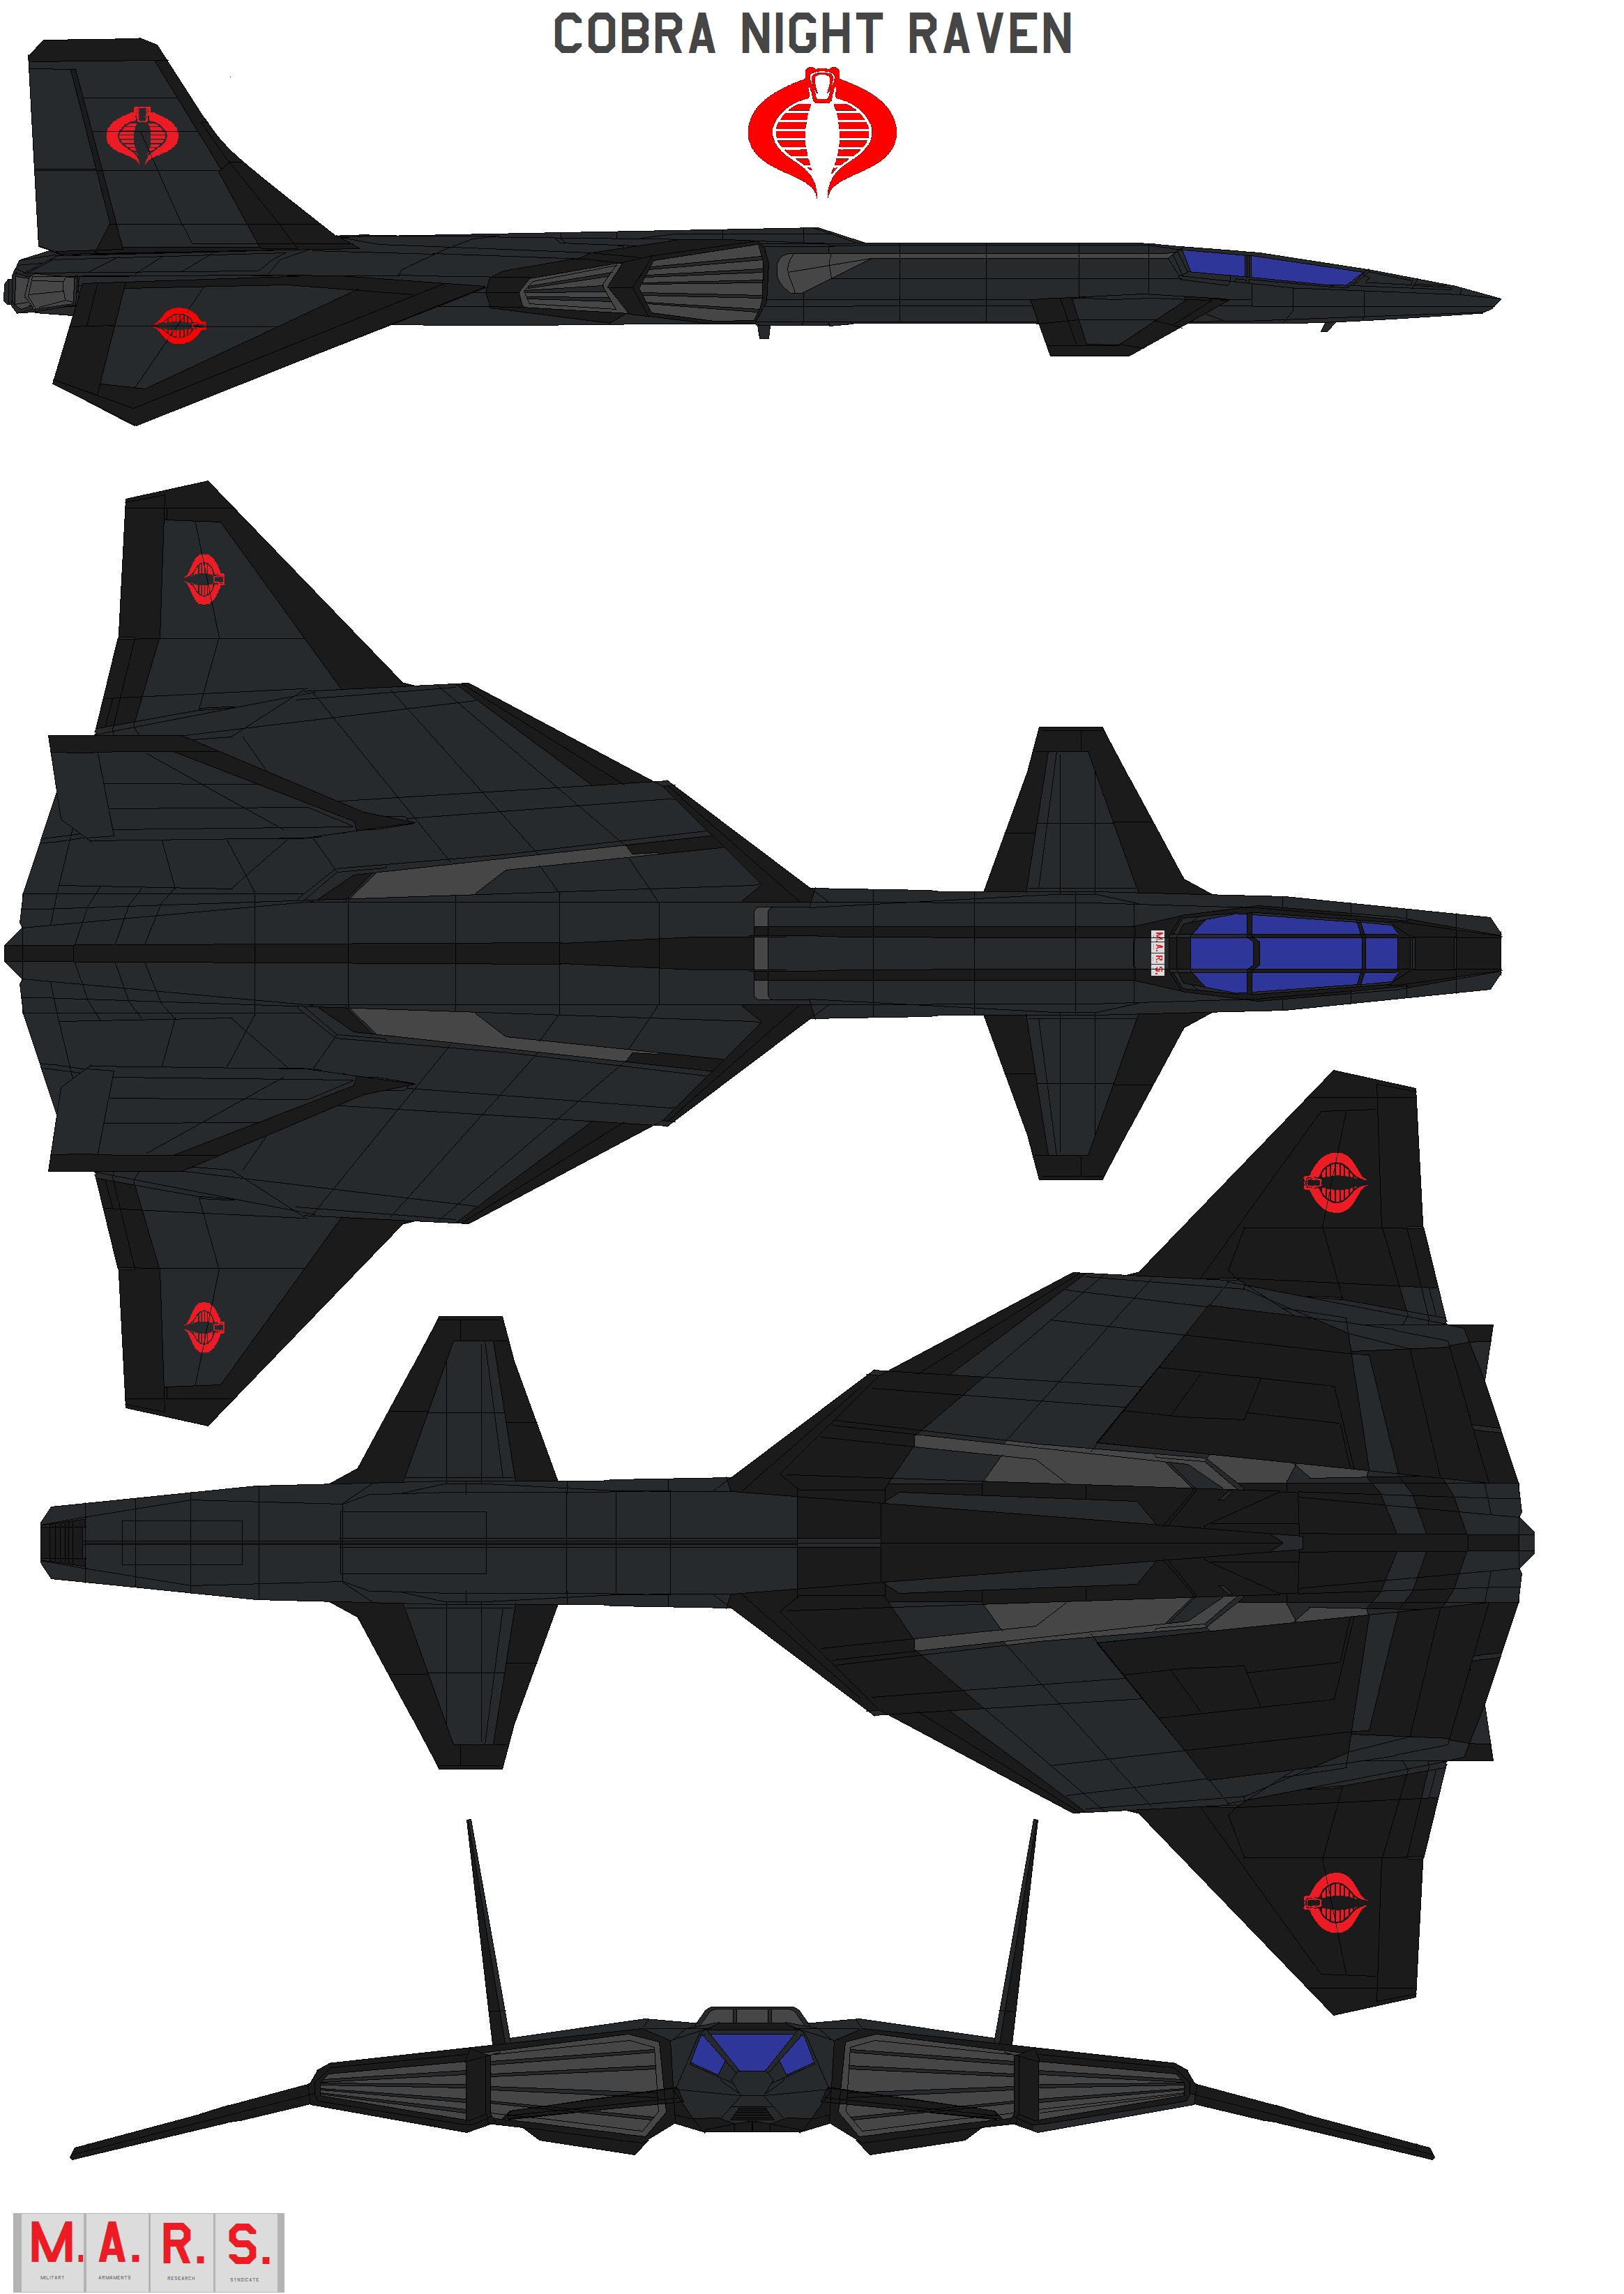 Cobra Night Raven by bagera3005